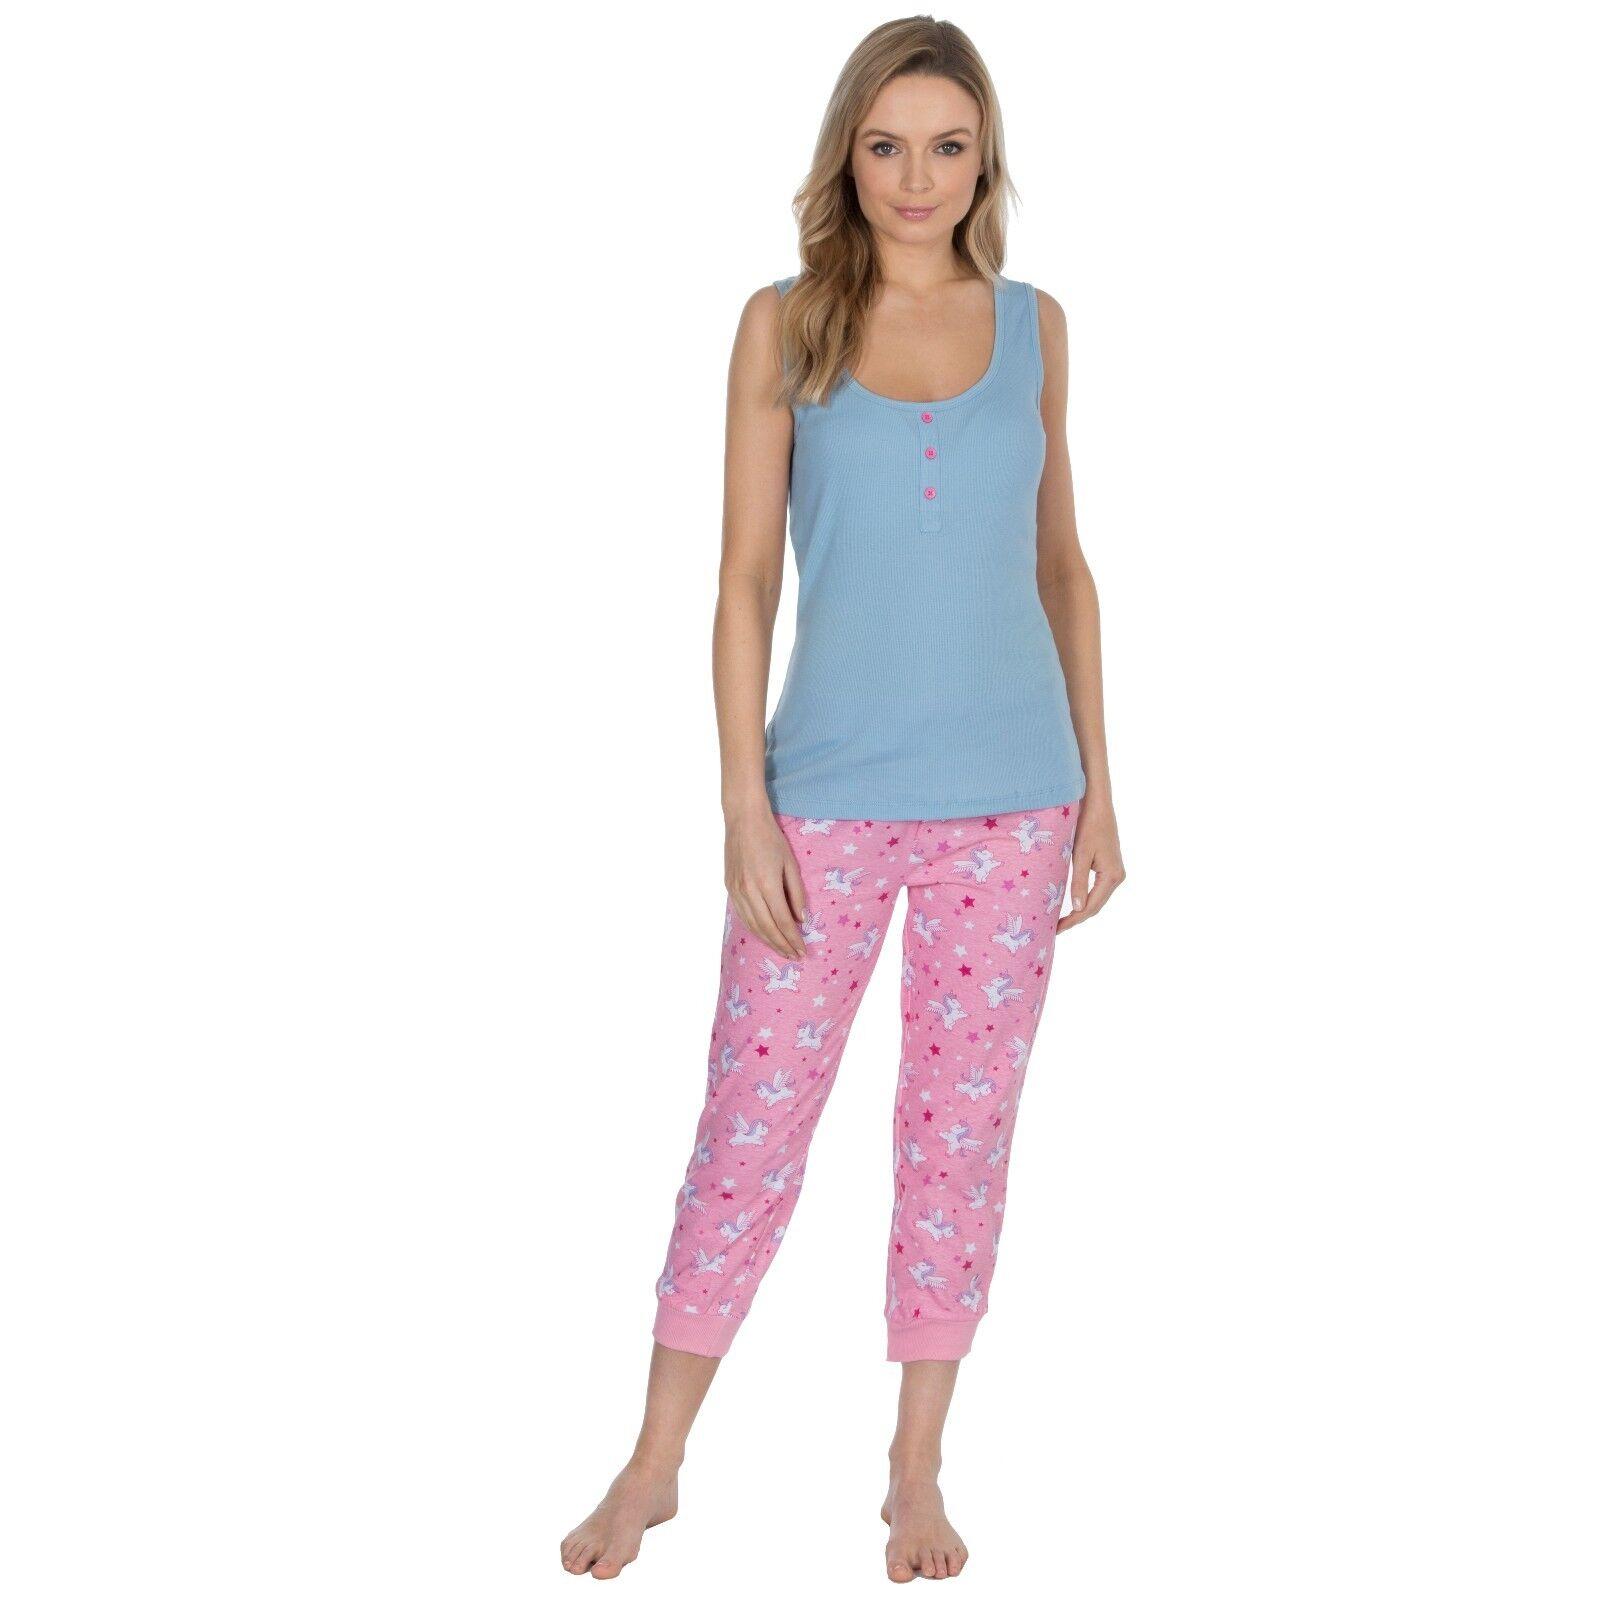 Damen Nachtwäsche Pyjama Trikot Rippen Ärmelloses Top, dreiviertel Länge Hose